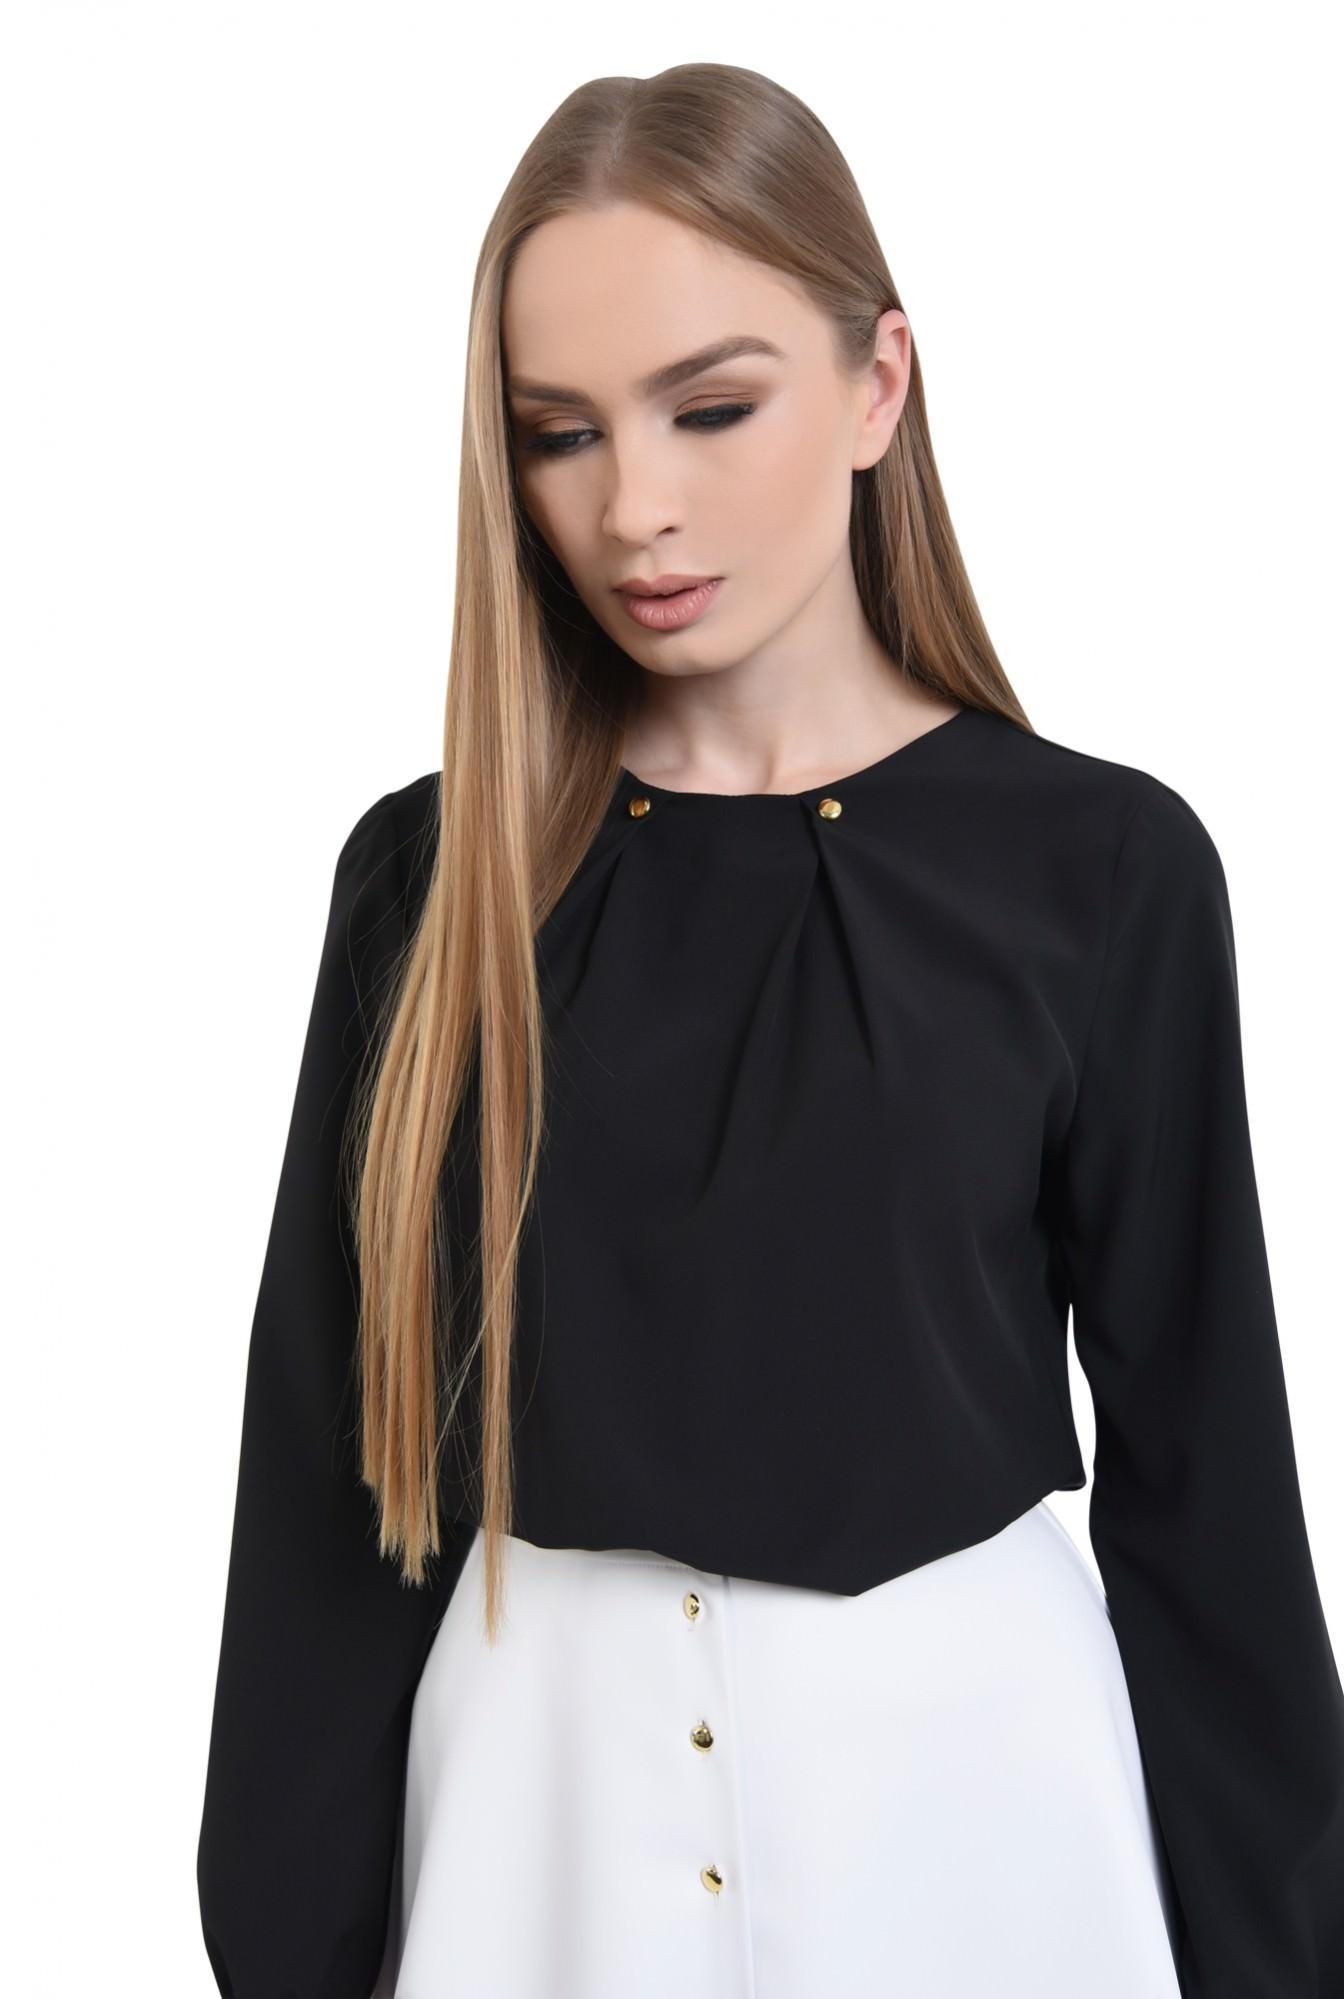 2 - Bluza eleganta, nasturi aurii, sifon